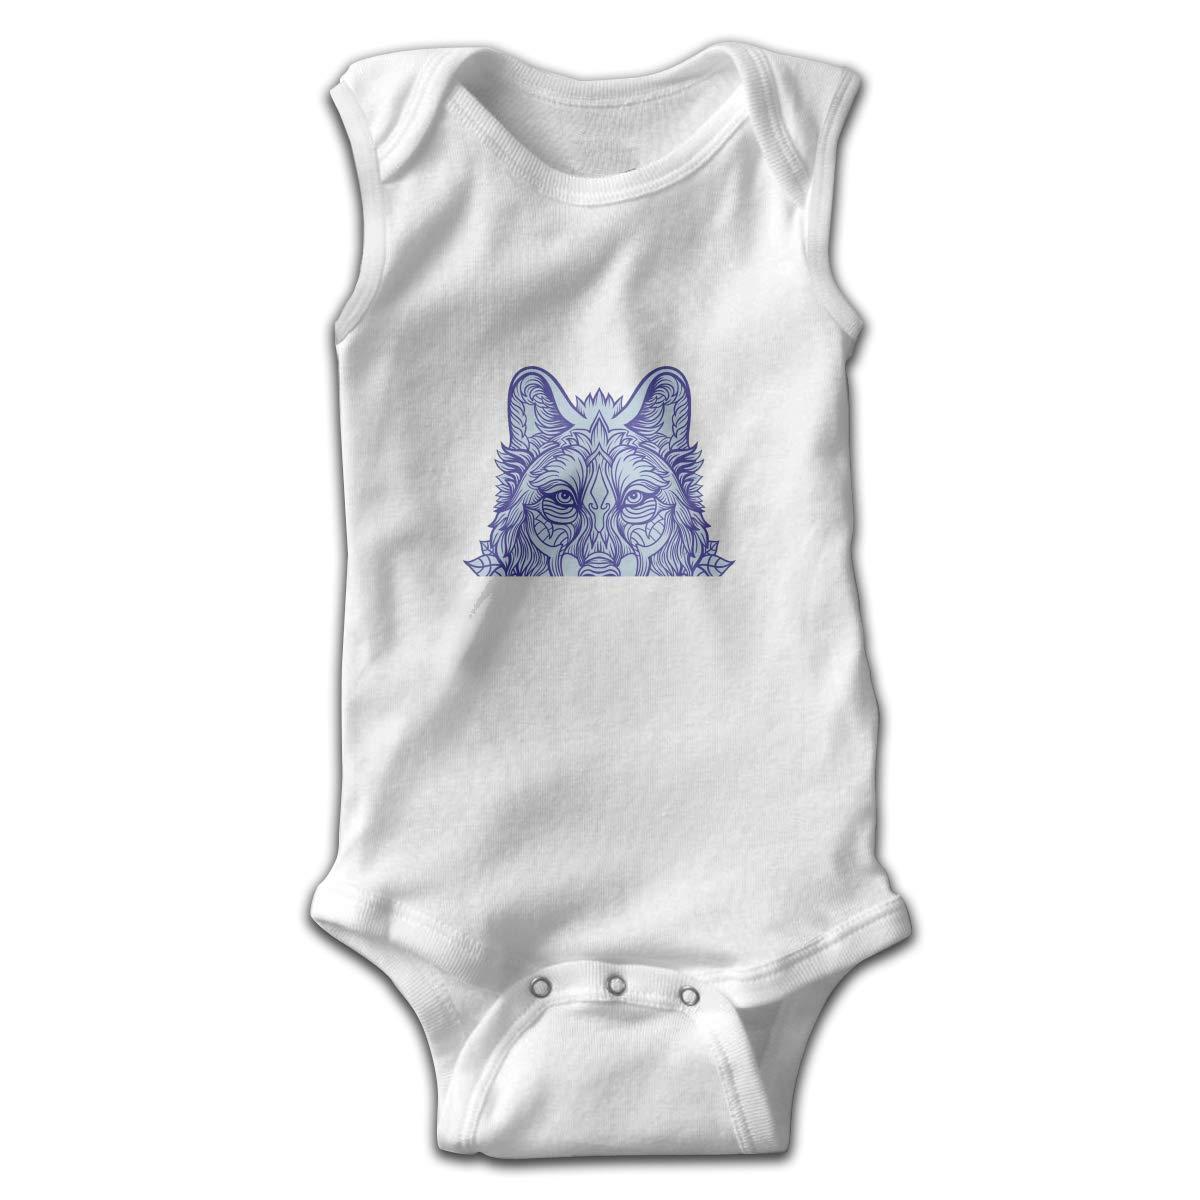 Wolf King Newborn Baby No Sleeve Bodysuit Romper Infant Summer Clothing Black